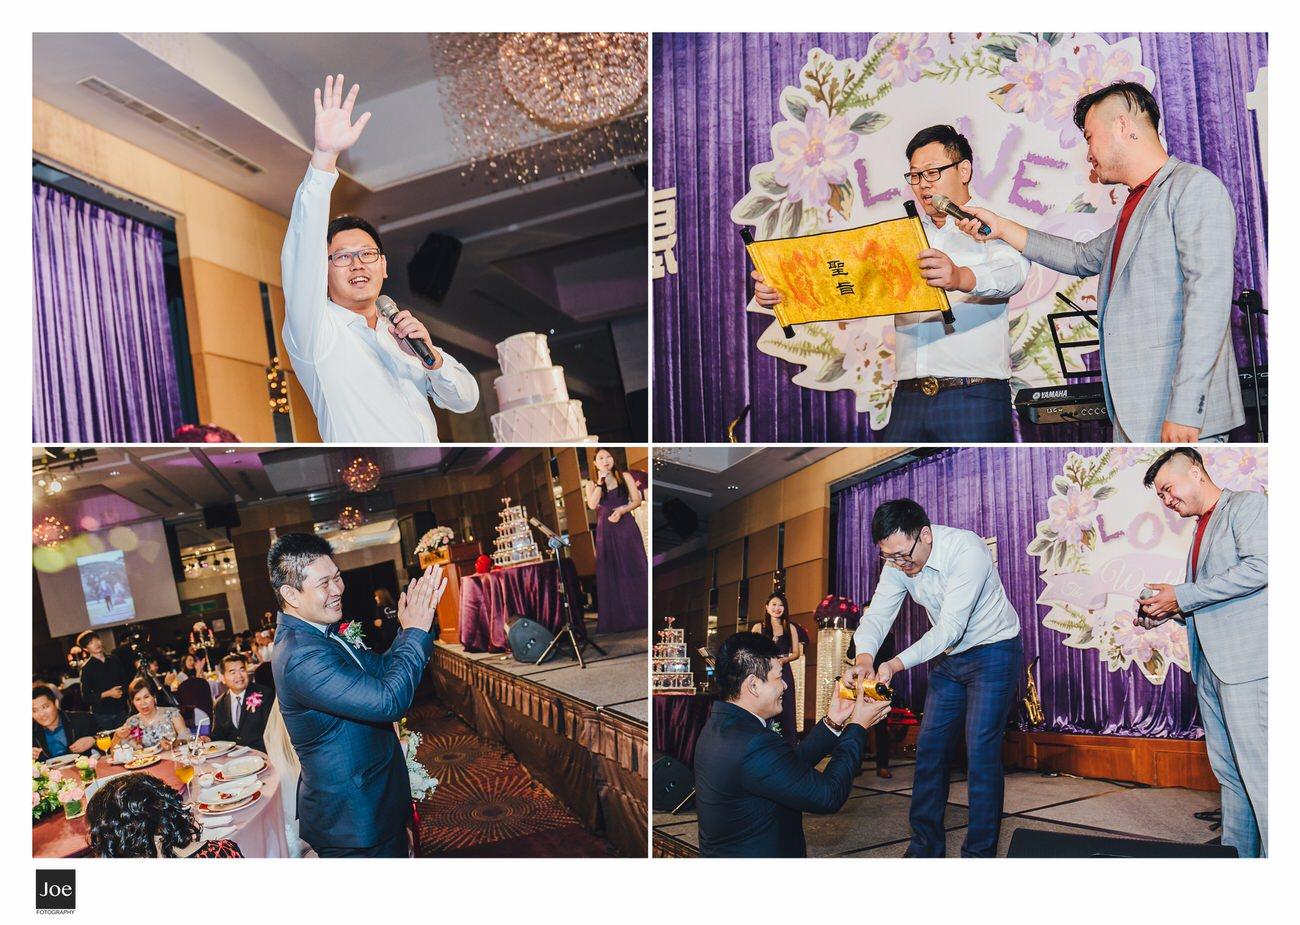 grand-hilai-hotel-wedding-daniel-yvette-joe-fotography-126.jpg